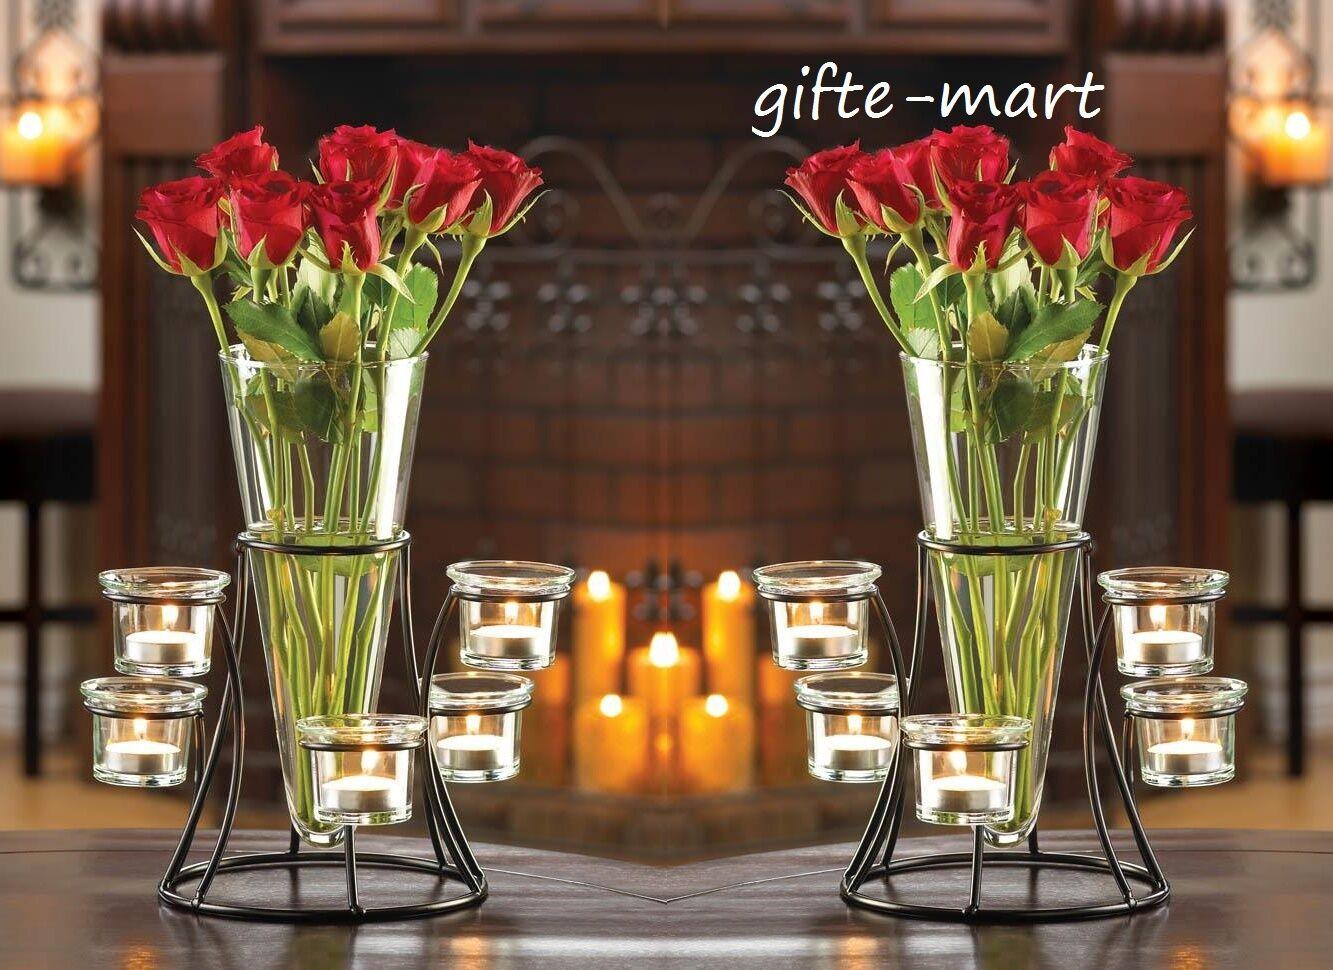 Dining Table Centerpiece Vases Rectangular Medium Gray Black Vintage Flower Vase For Sale Online Ebay